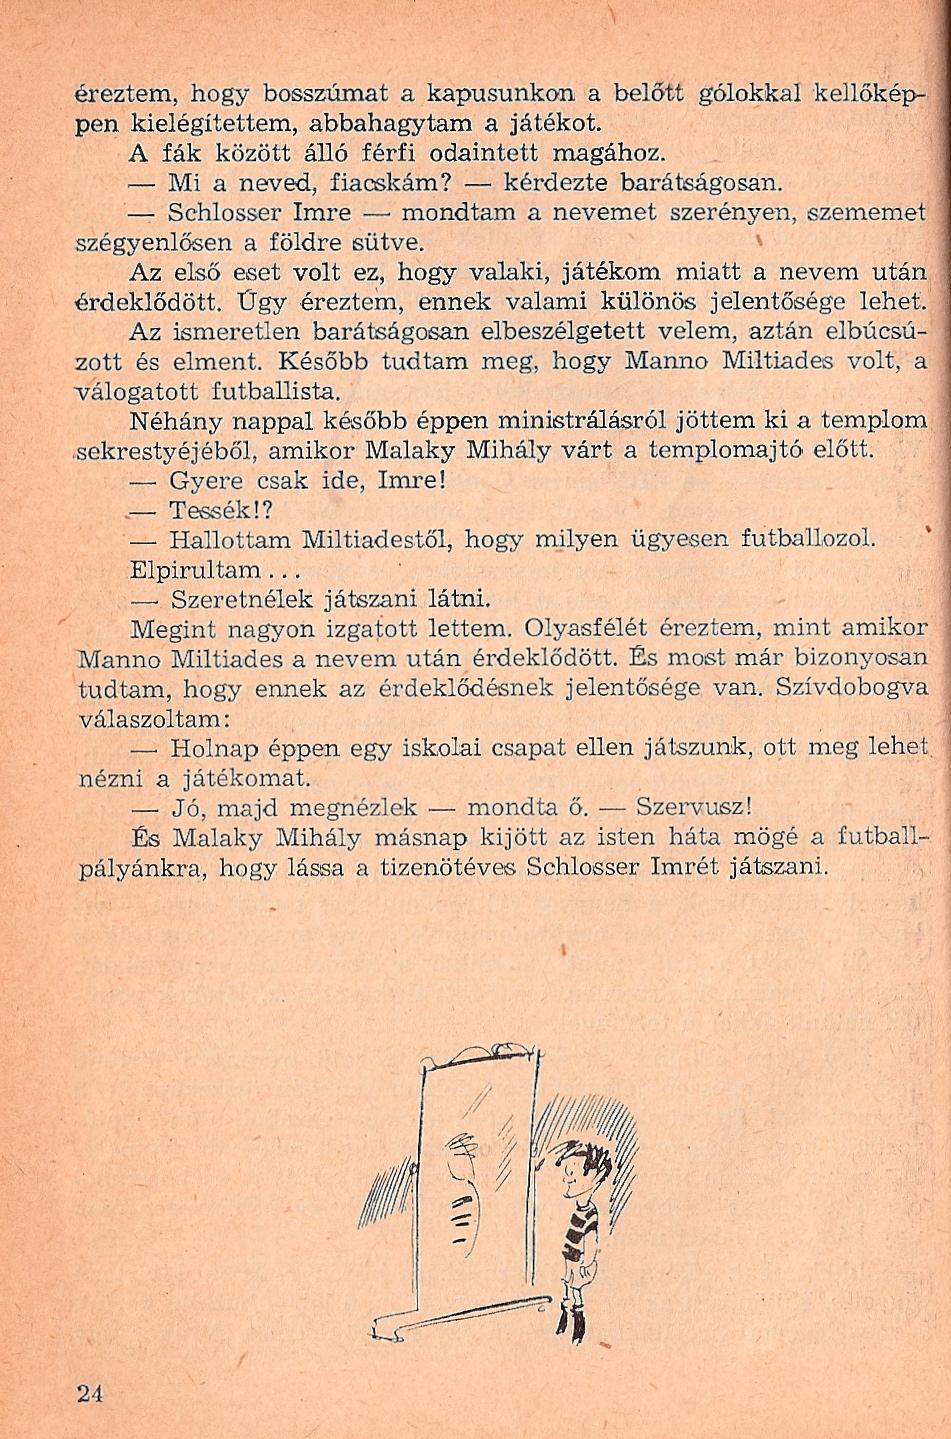 schlosser_fel-evszazad_1957_24_1020